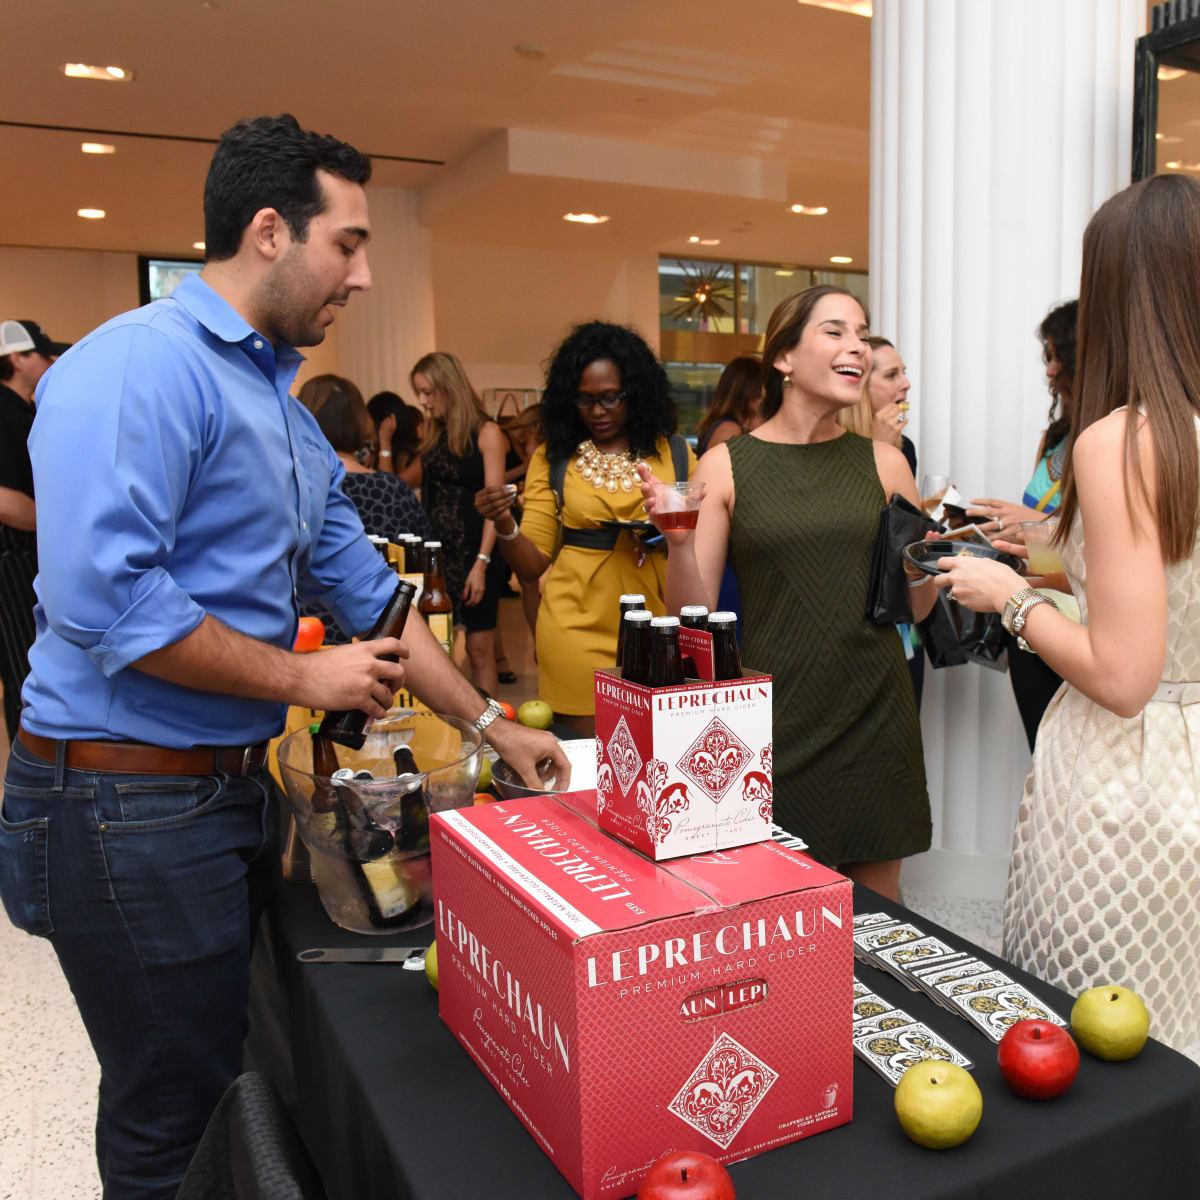 News, Shelby, Women of Wardrobe Back to School, Aug. 2015, Jake Schiffer of Leprechaun Cider